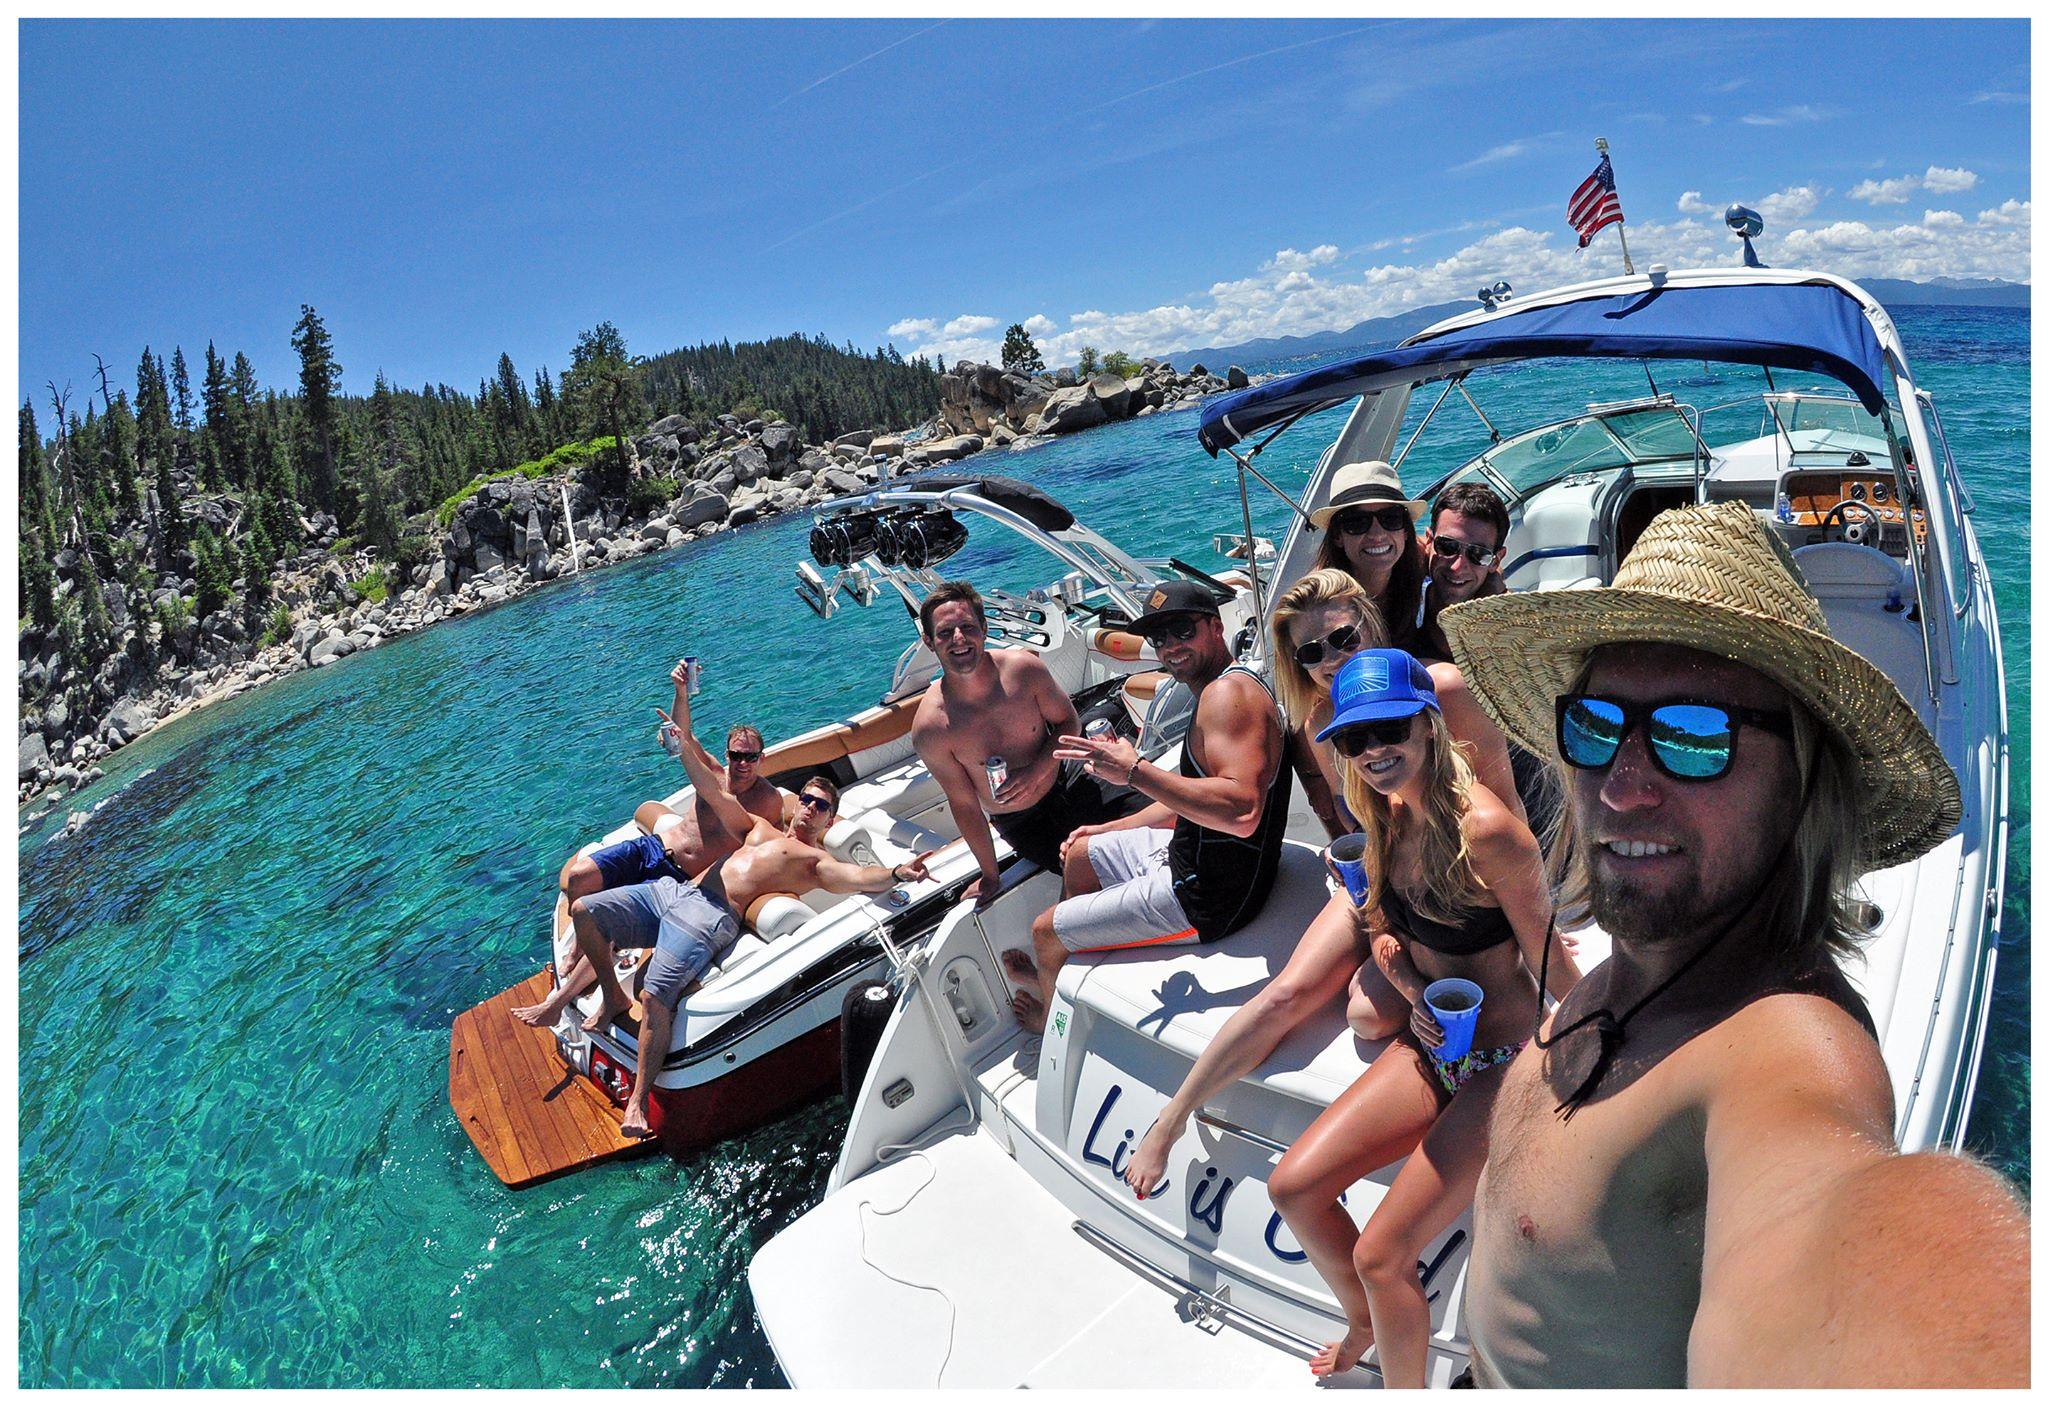 On a boat.jpg